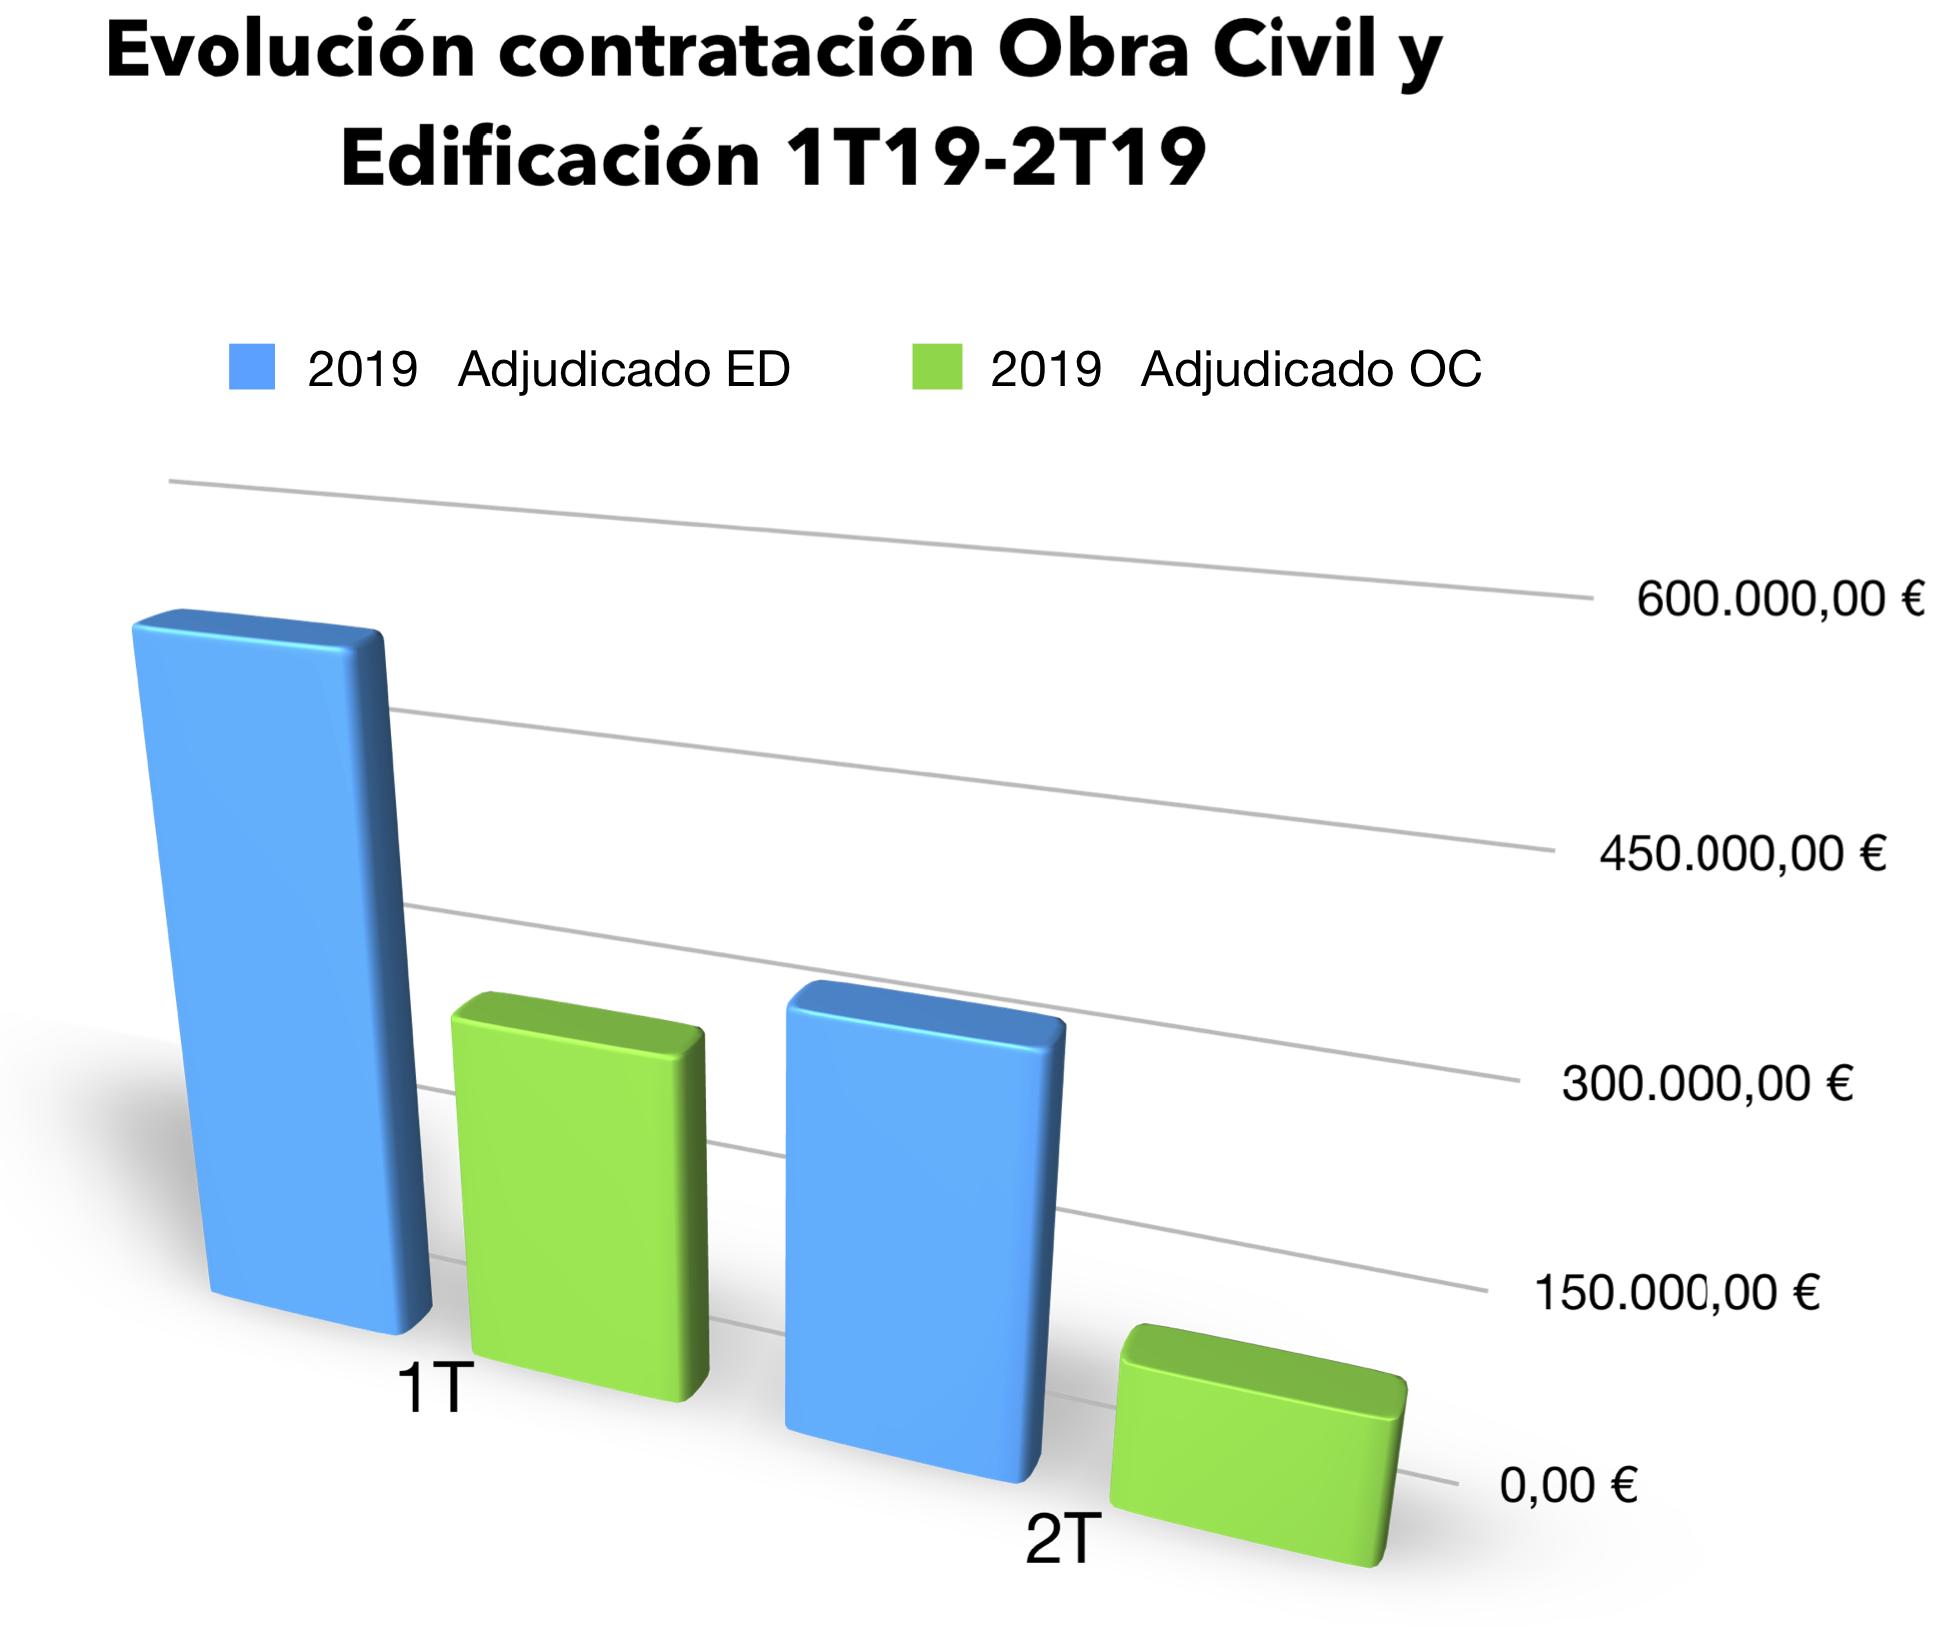 Evolucion contratacion 1t19 2t19